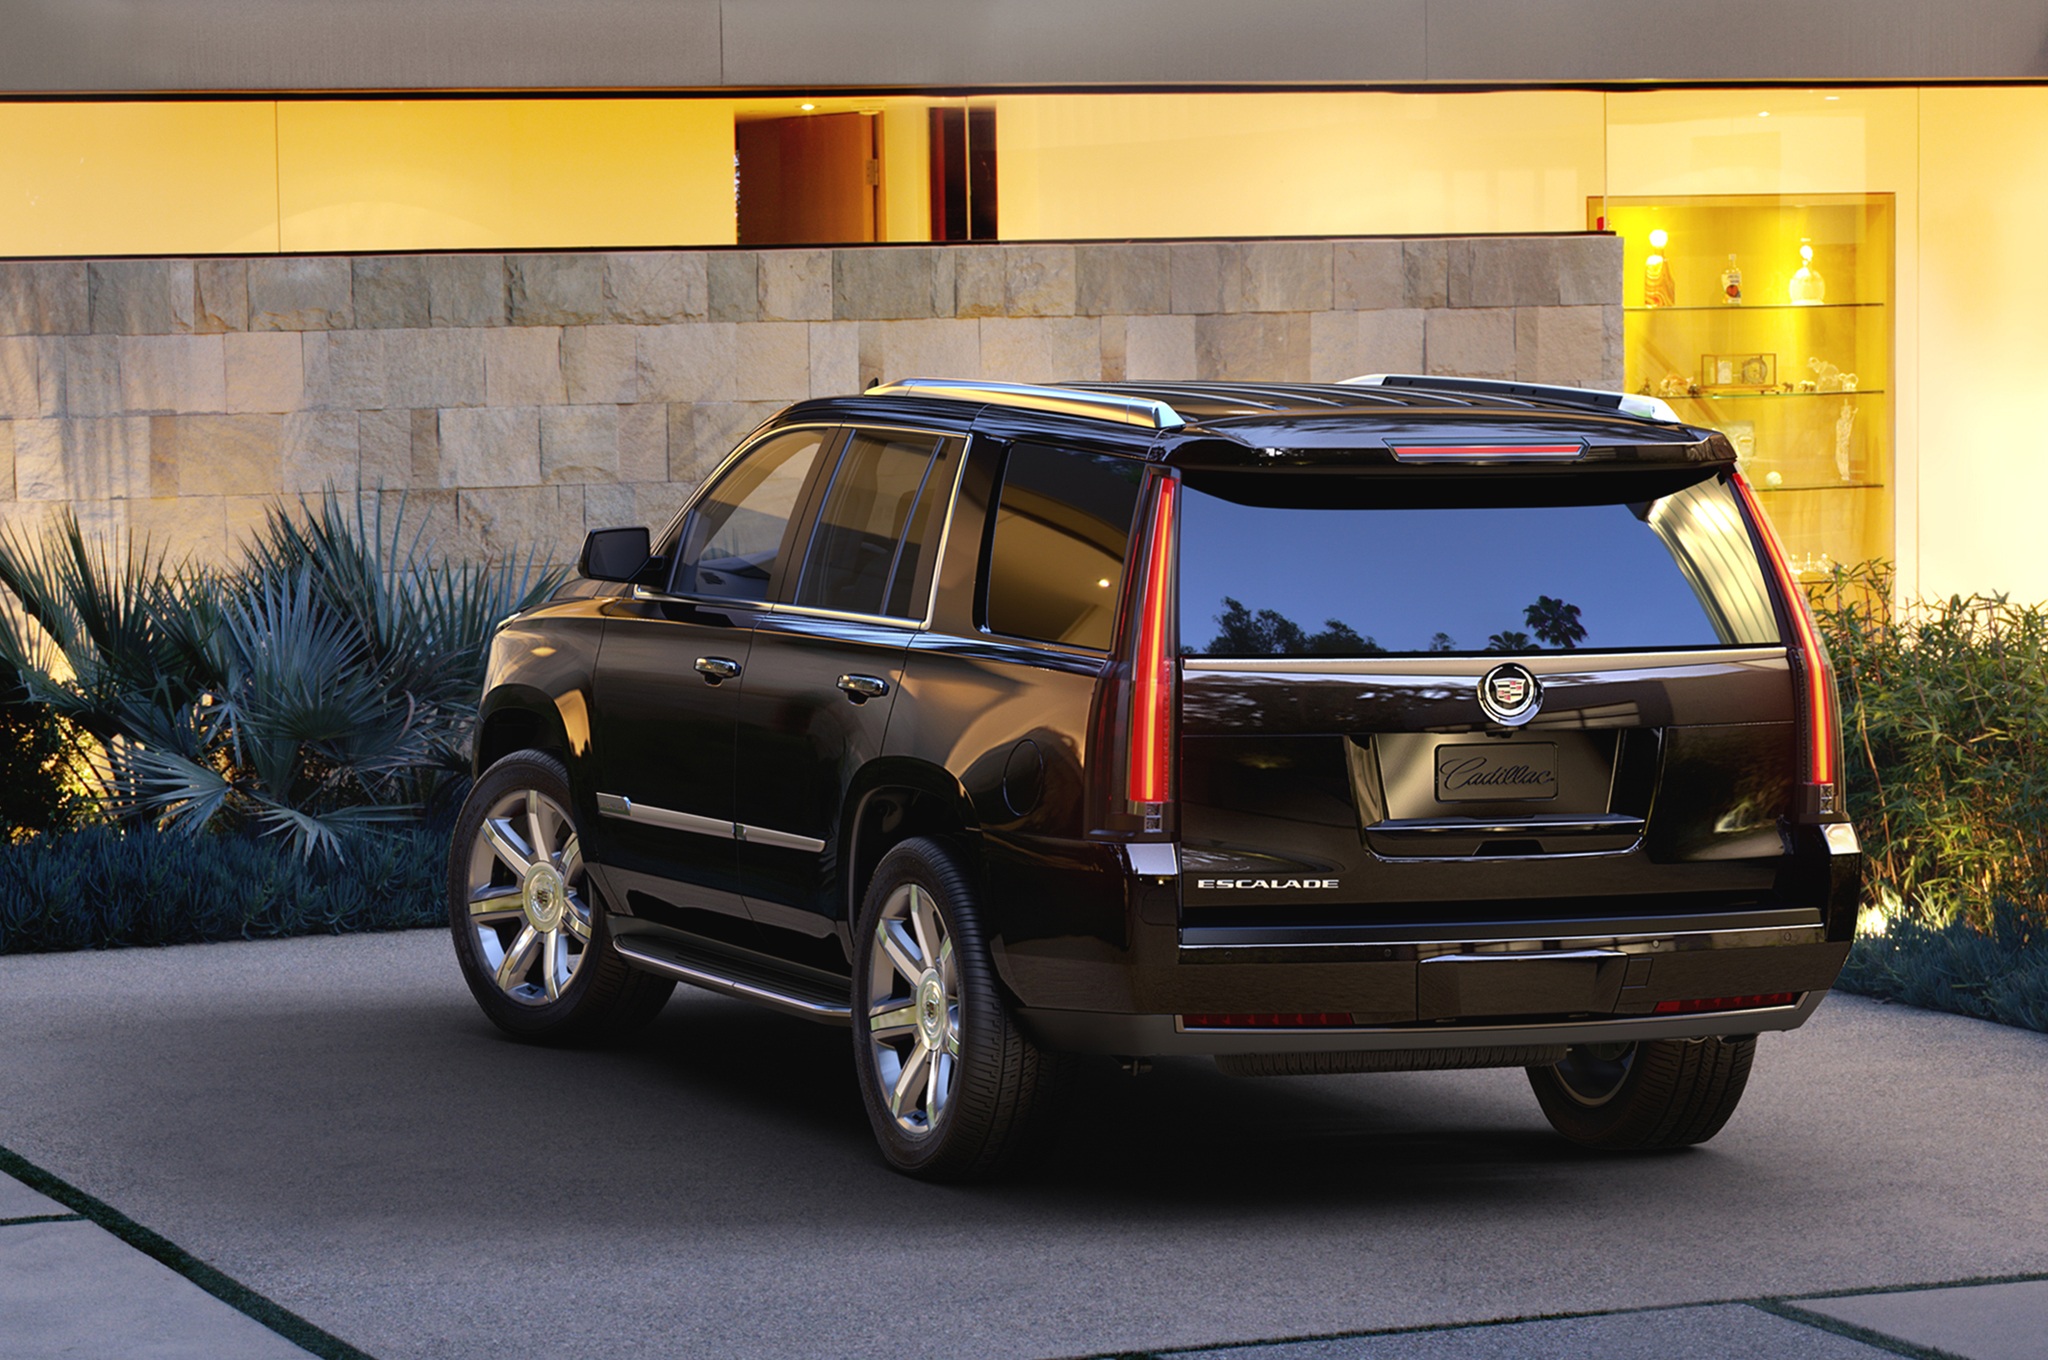 2015 Cadillac Escalade Rear Side View